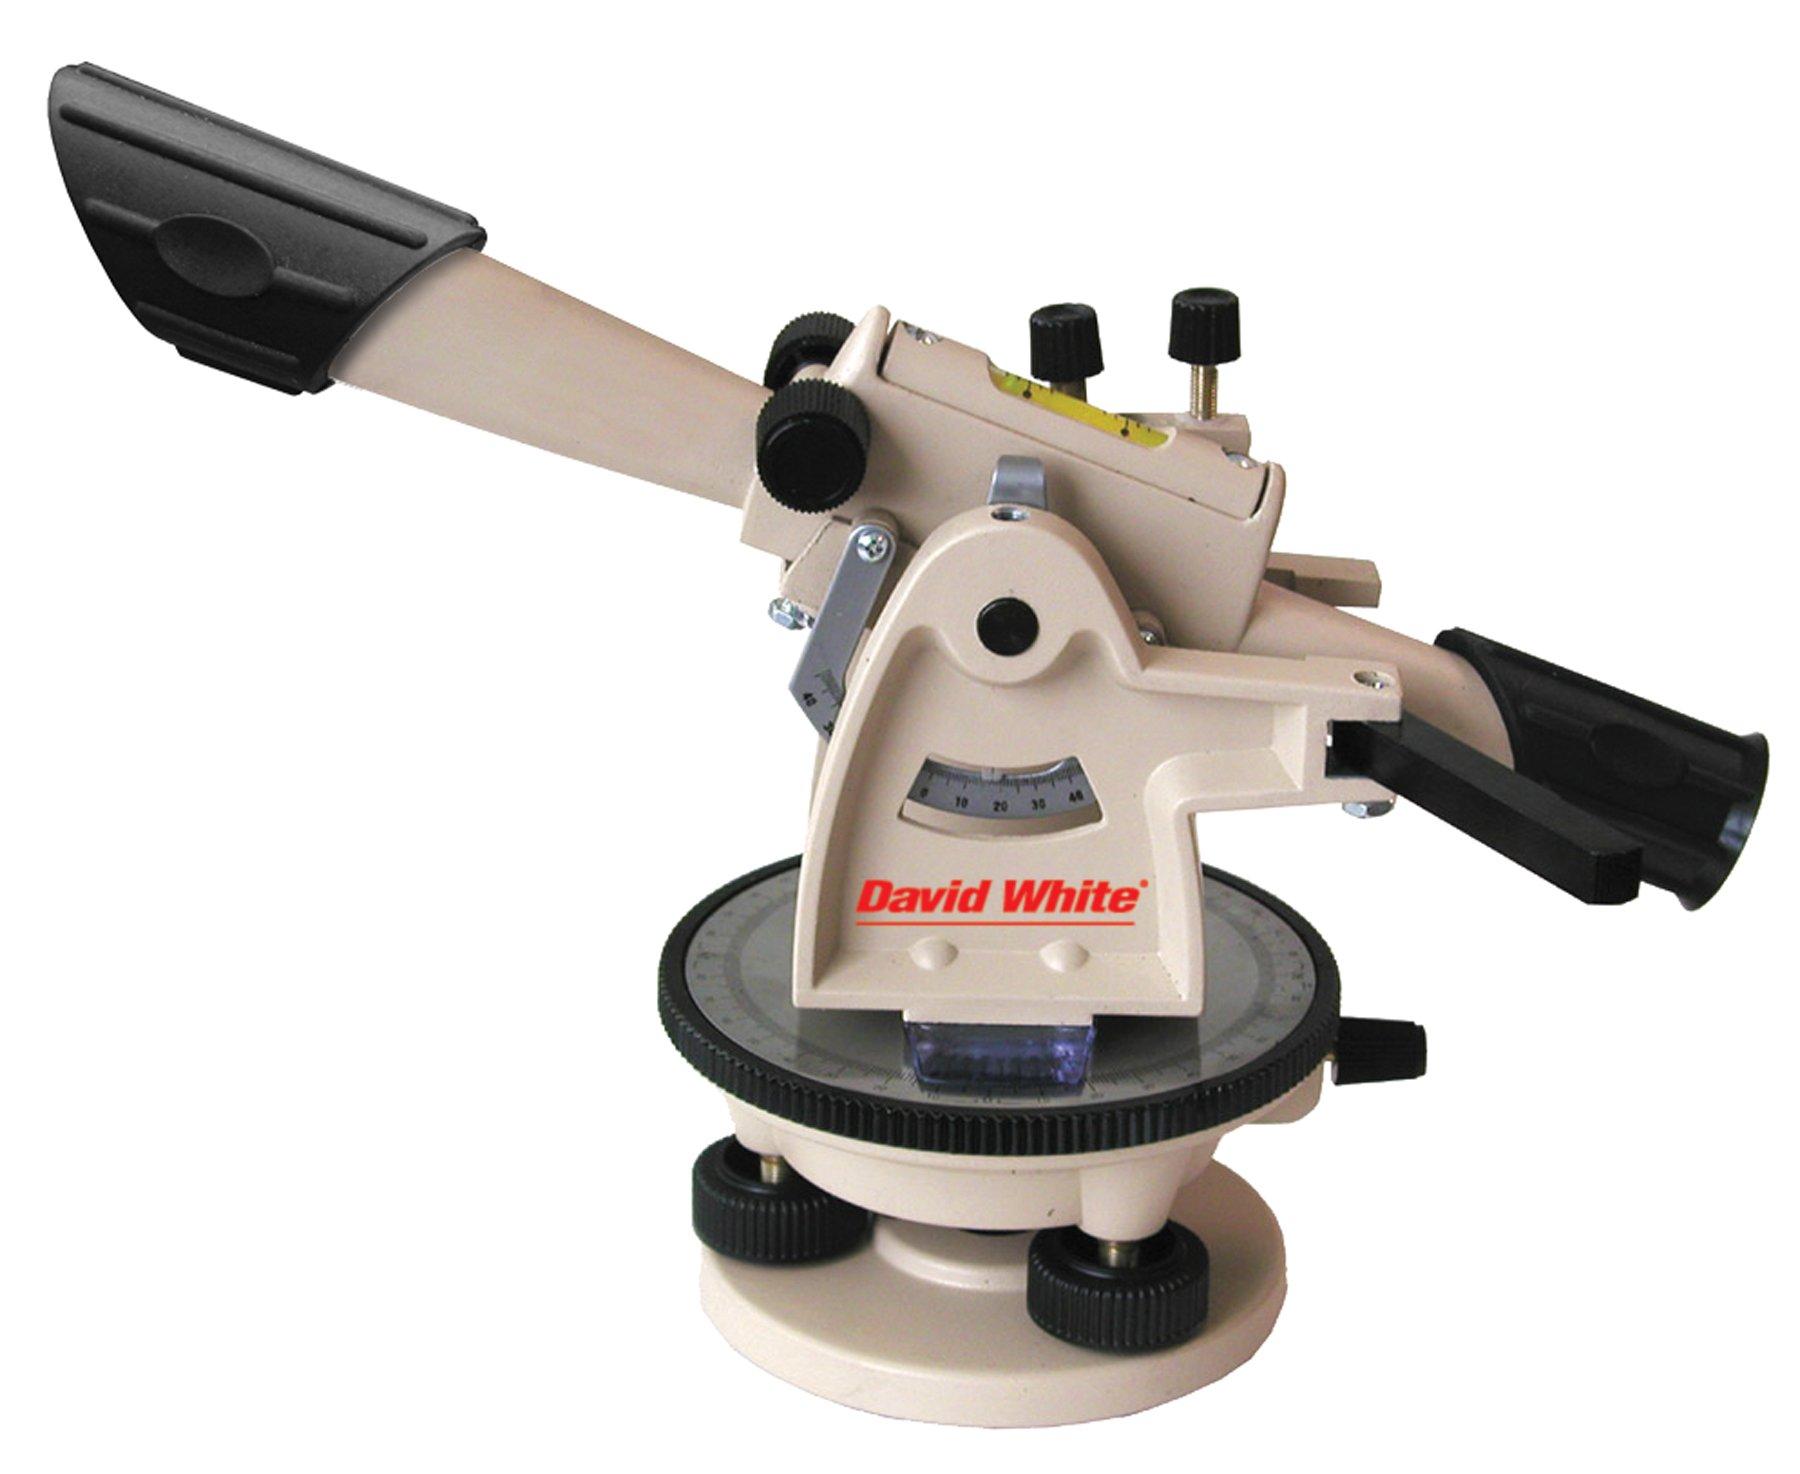 David White LT6-900 Meridian 22X Optical Level-Transit by David White